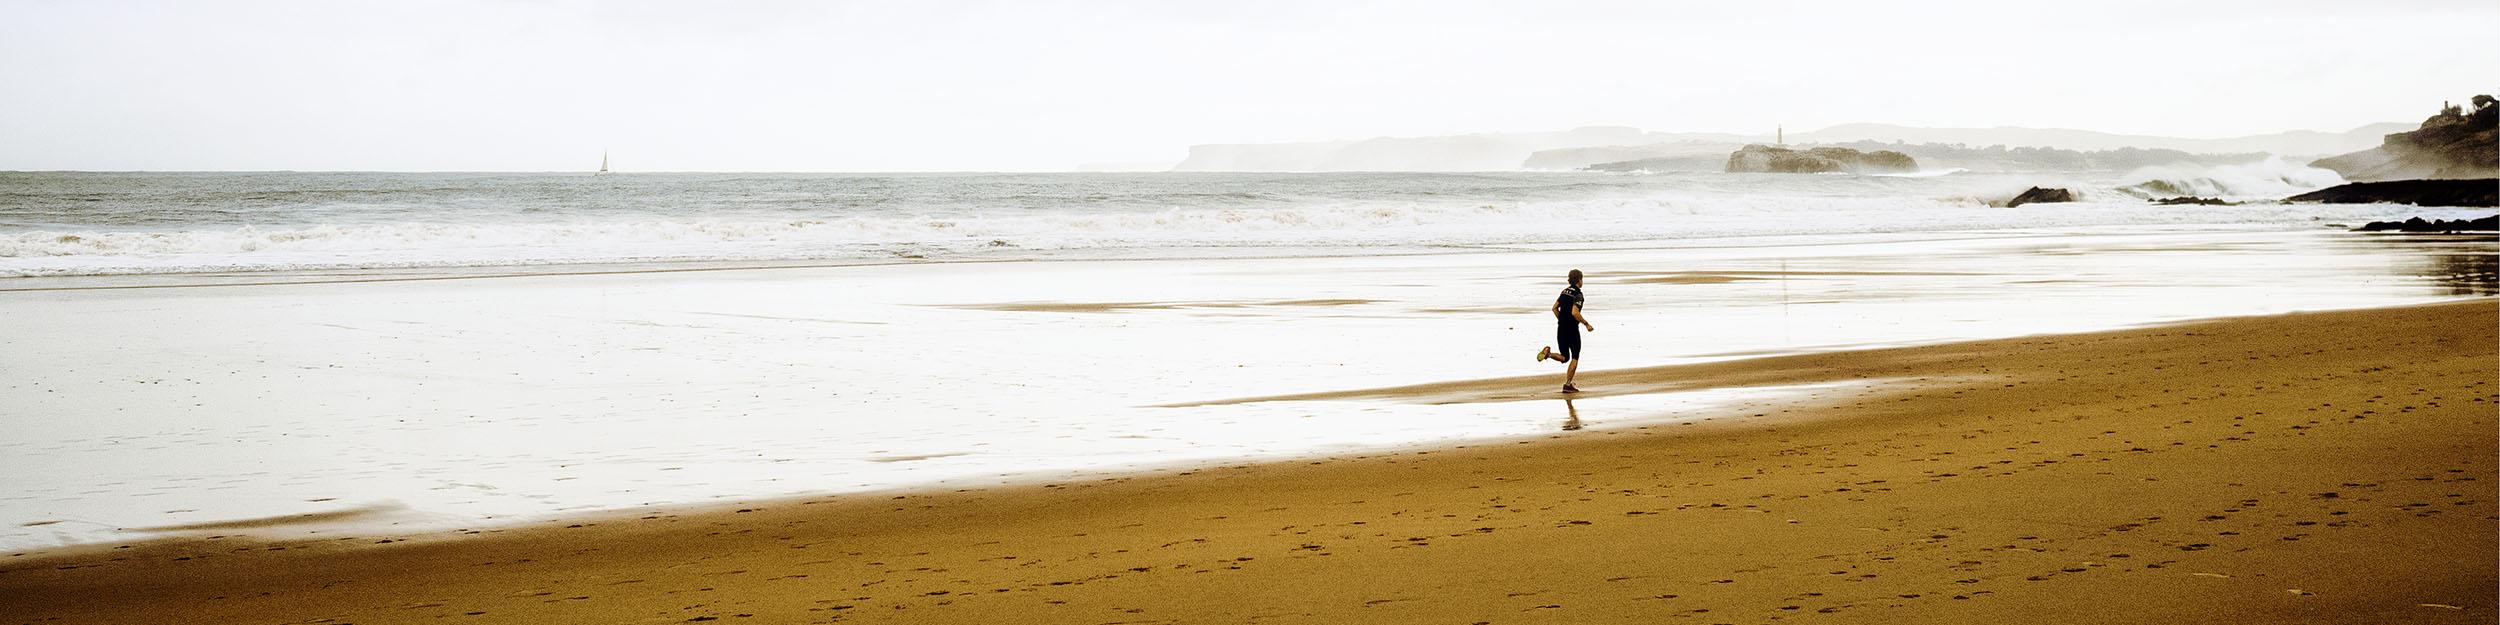 chico corriendo playa